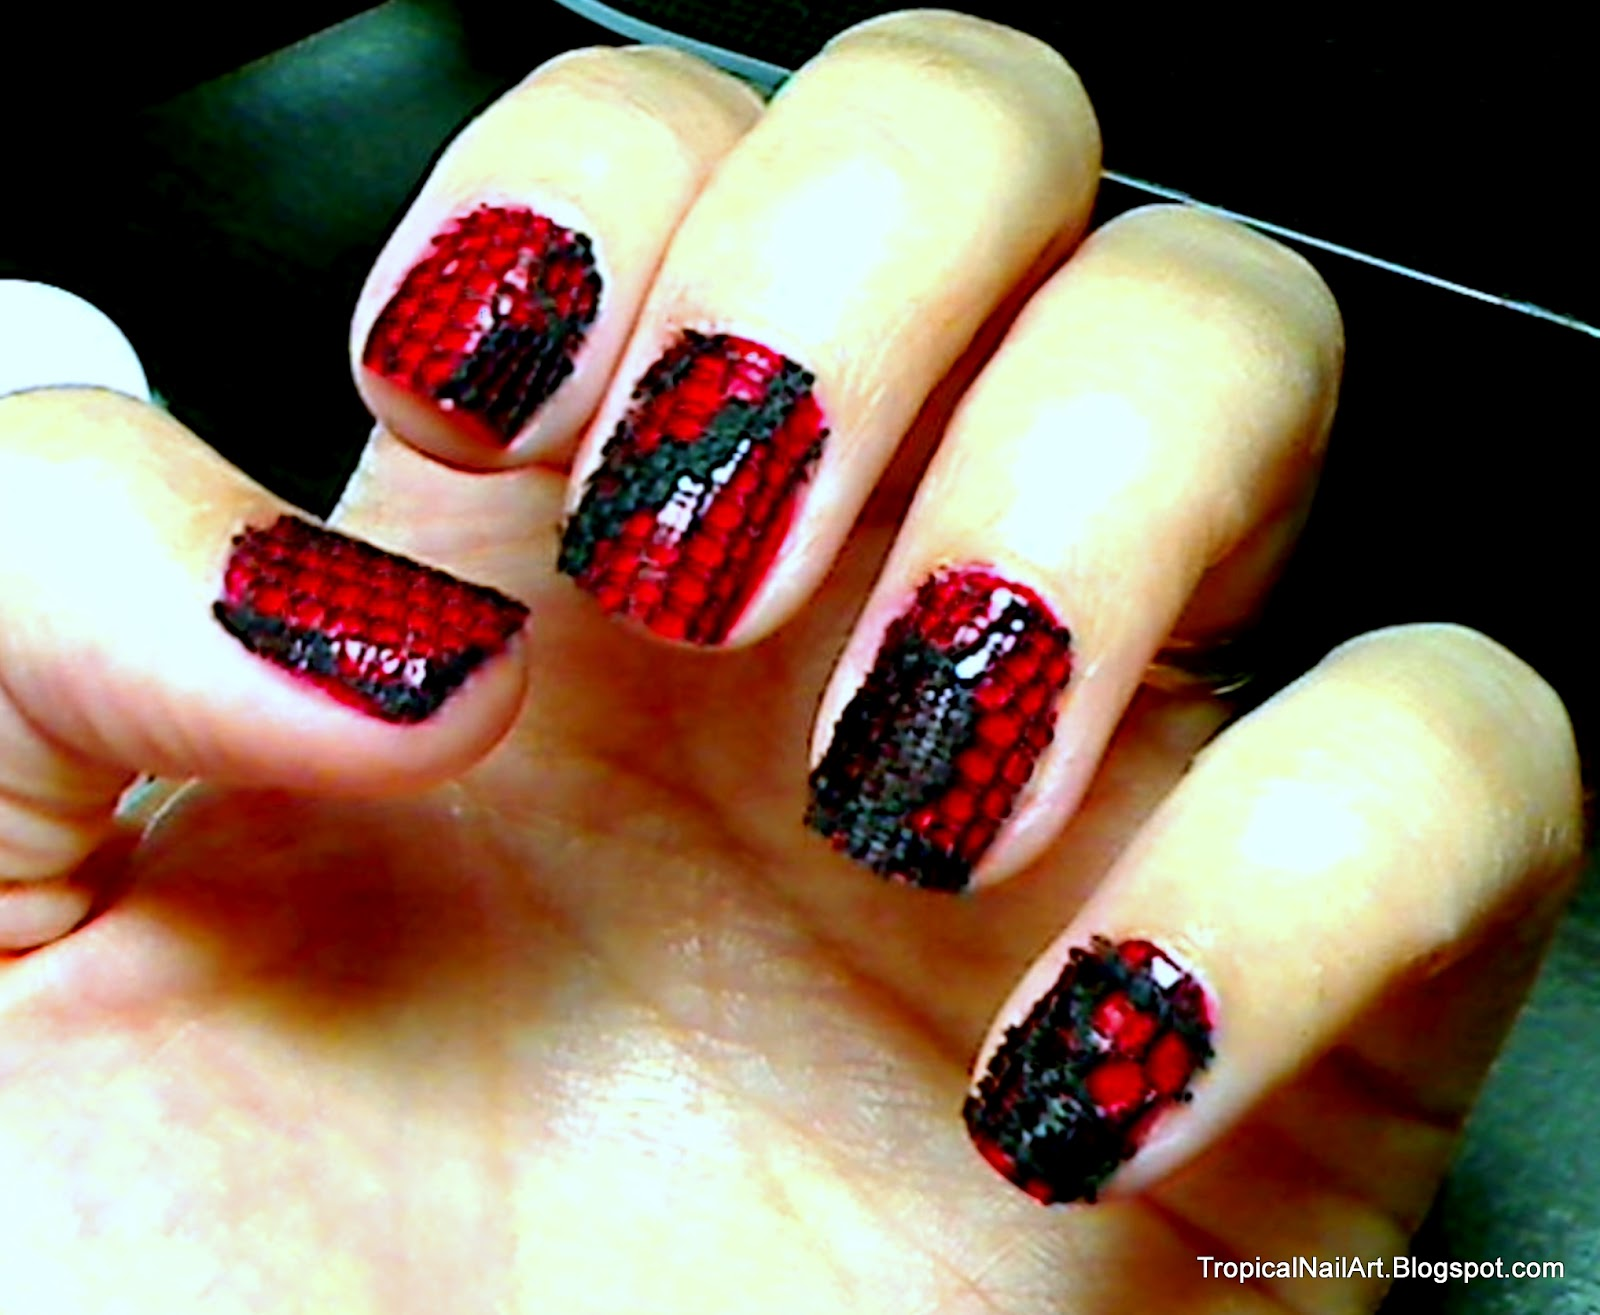 Tropical Nail Art Catwoman